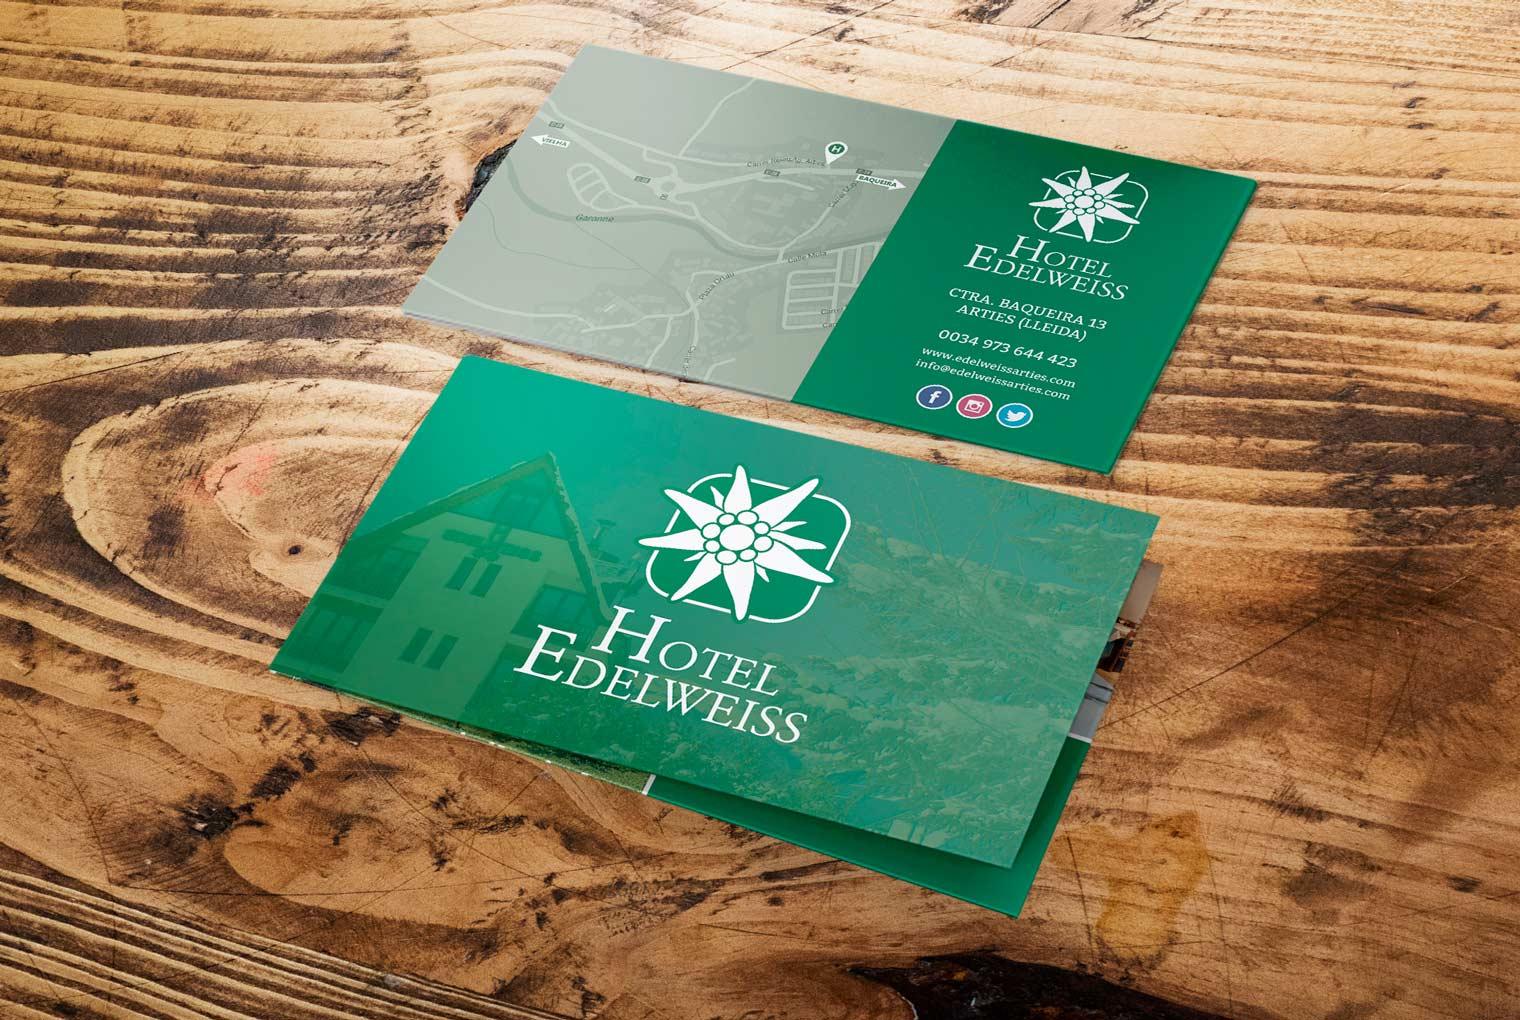 hotel-edelweiss-diptico